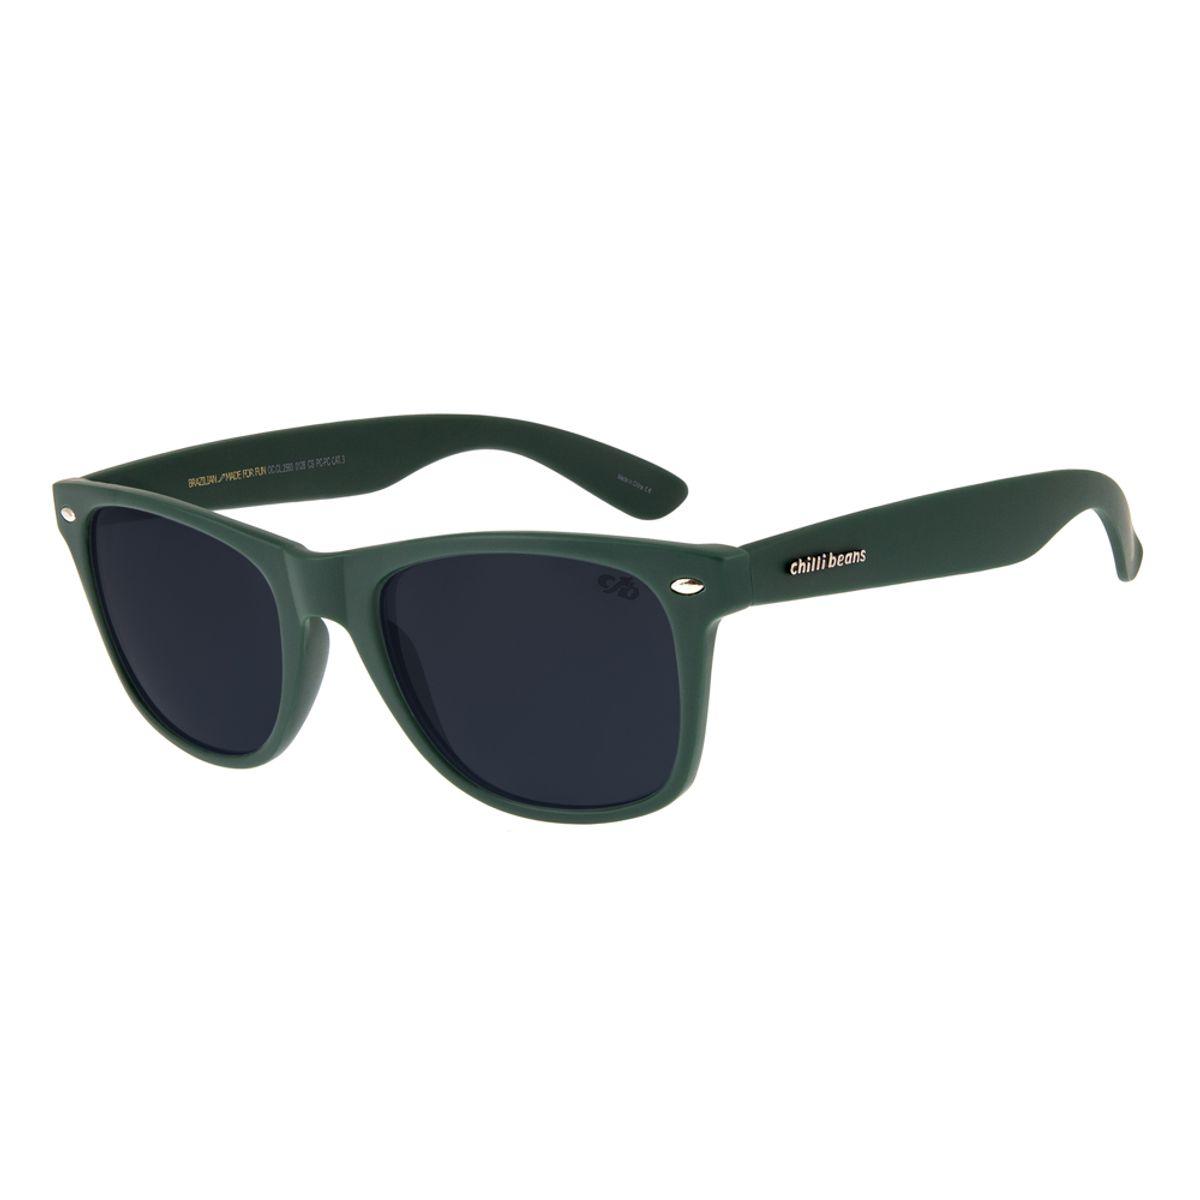 4343505a001c5 Óculos de Sol Chilli Beans Unissex Bossa Nova Verde 2583 - Chilli Beans